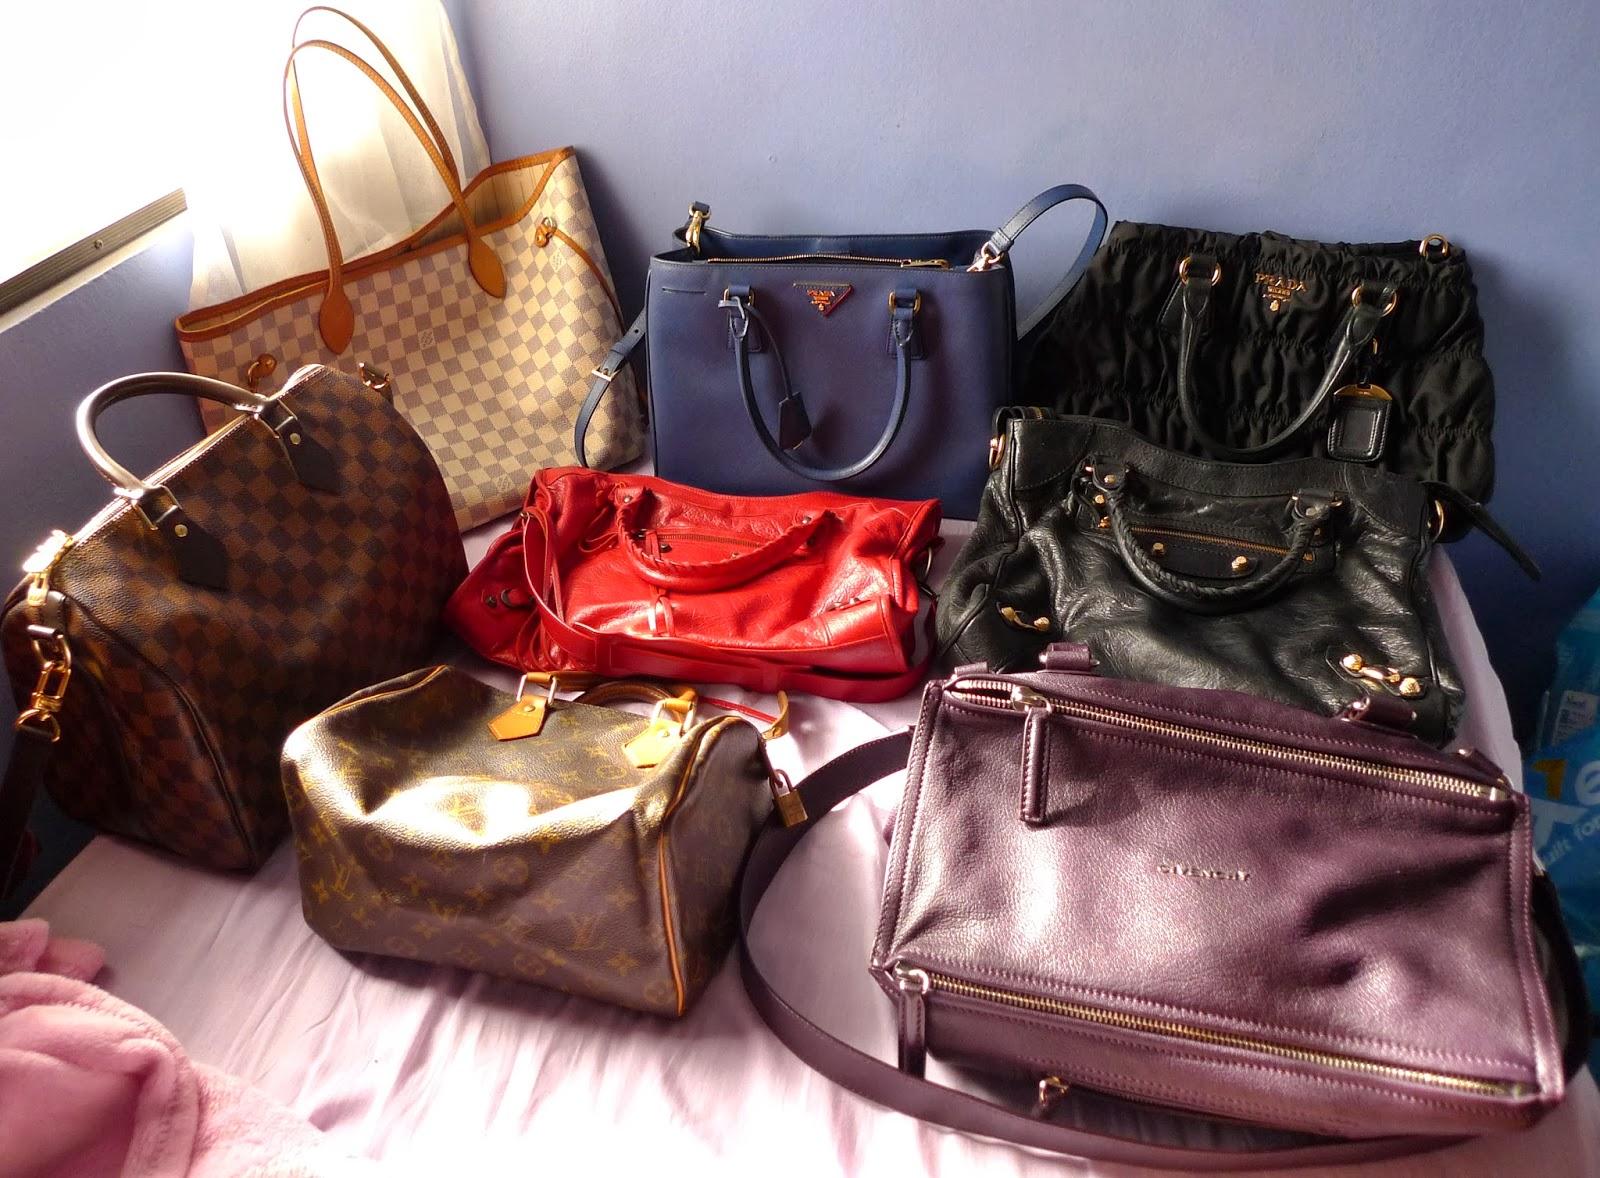 aea90b735b5d Chanel Backpack For Sale Ebay- Fenix Toulouse Handball